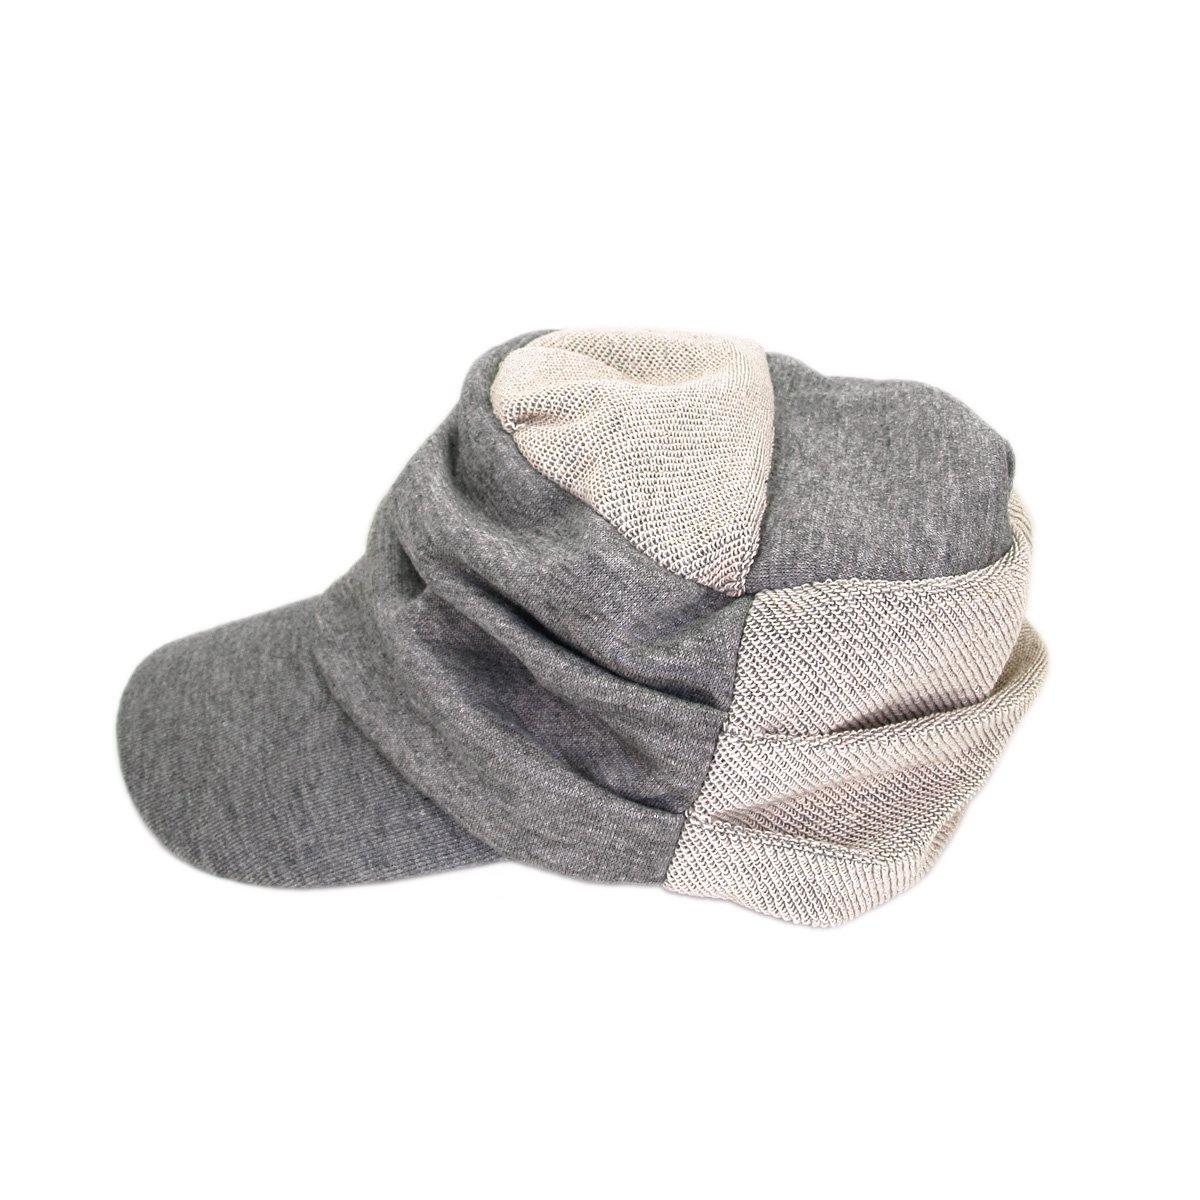 1361533ad1b TrendsBlue Trendy Cotton Grey 2-Tone Soft Cadet Cap Hat  Amazon.co.uk   Clothing